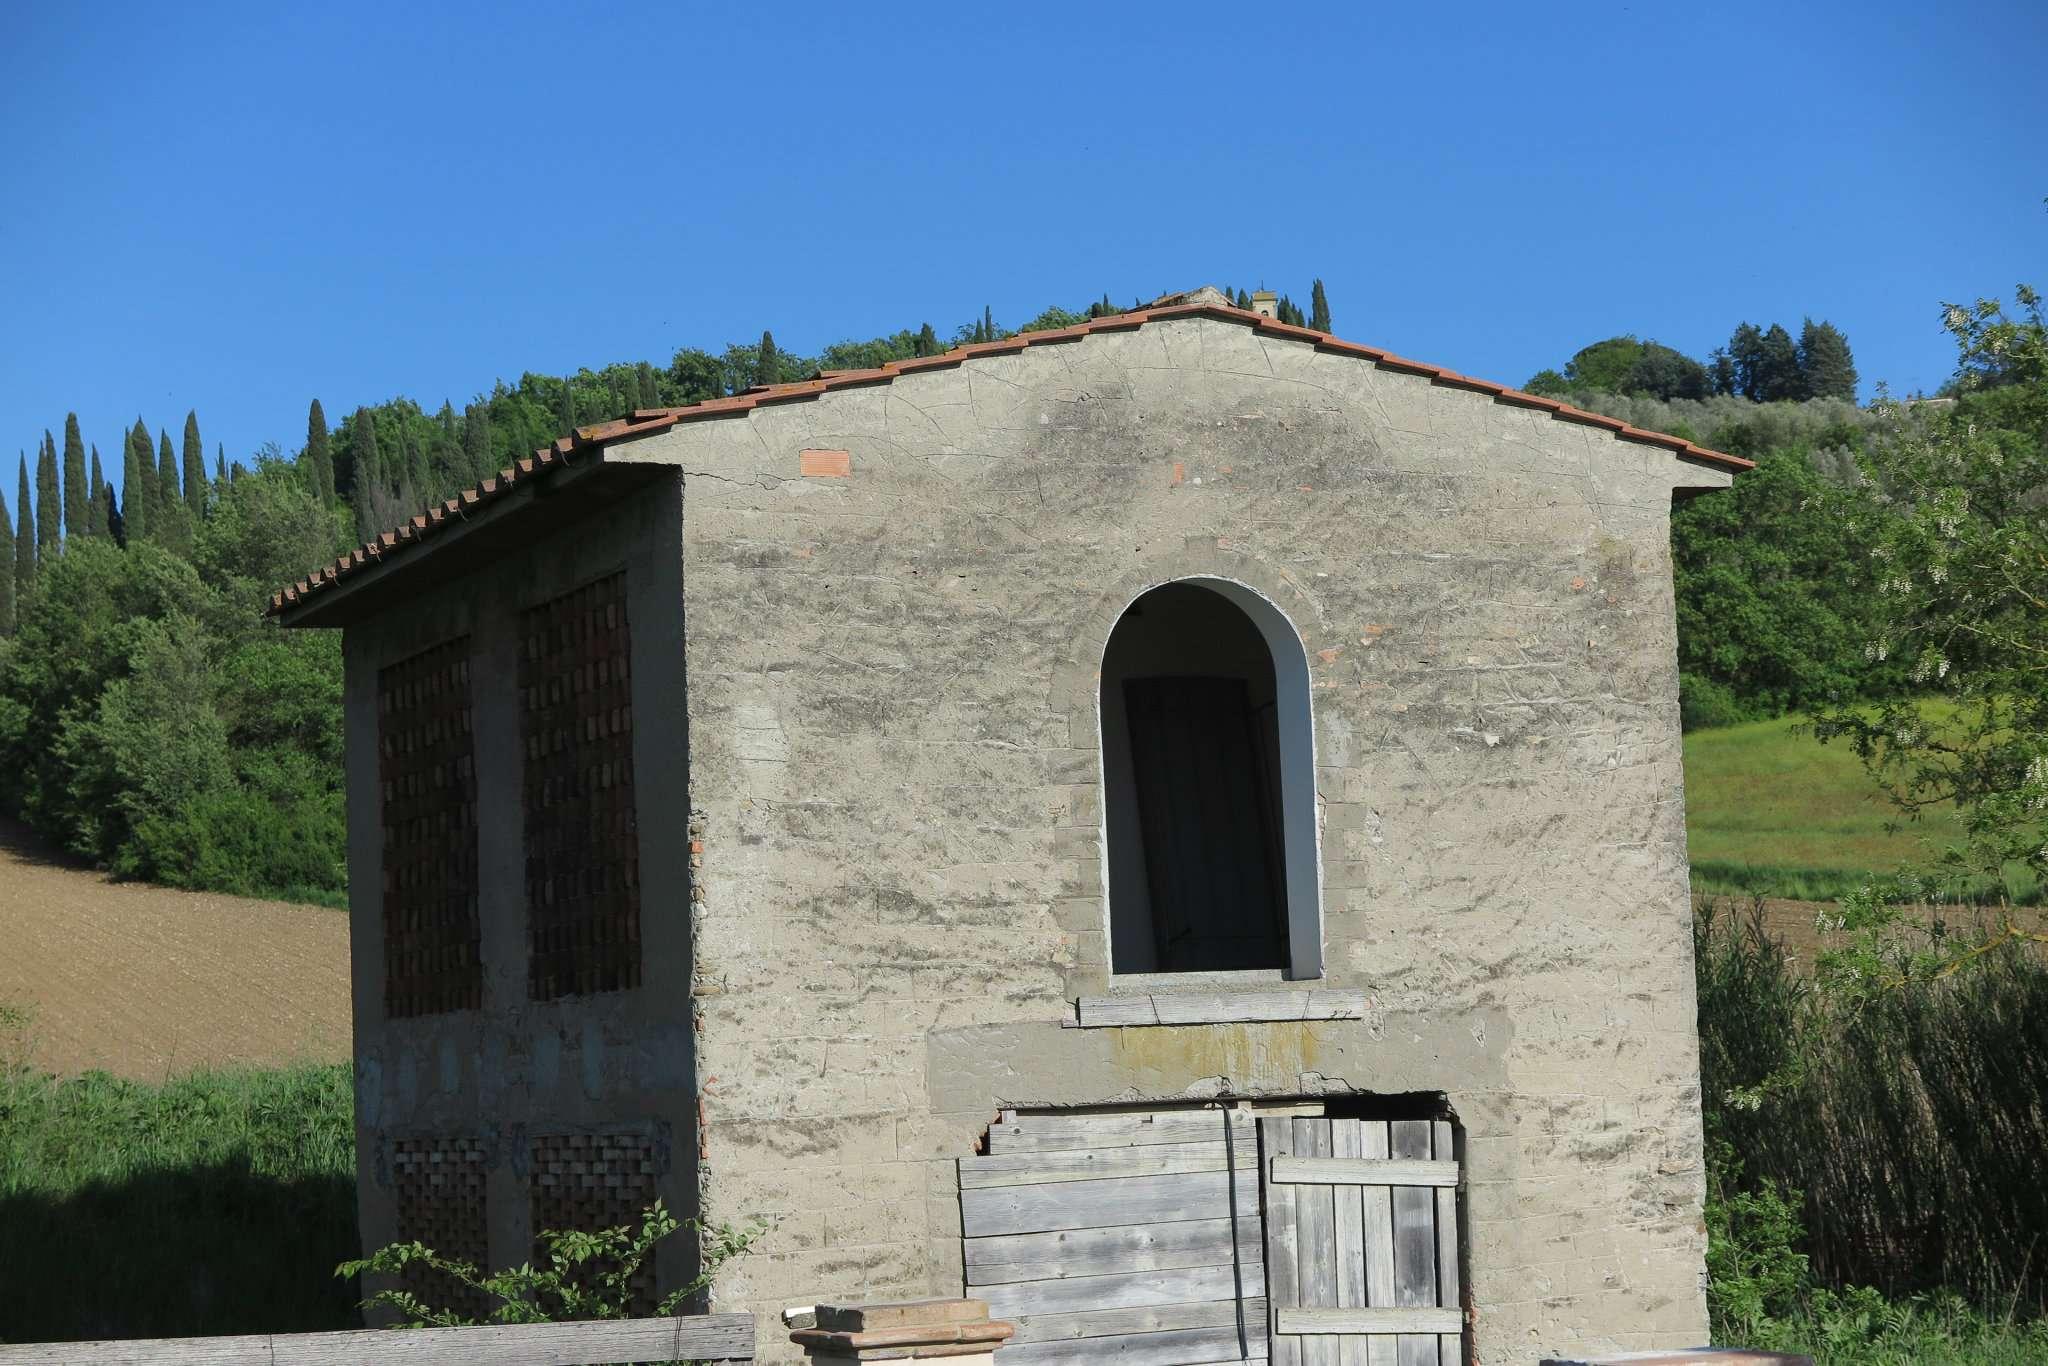 Bilocale San Casciano in Val di Pesa Via Empolese 11